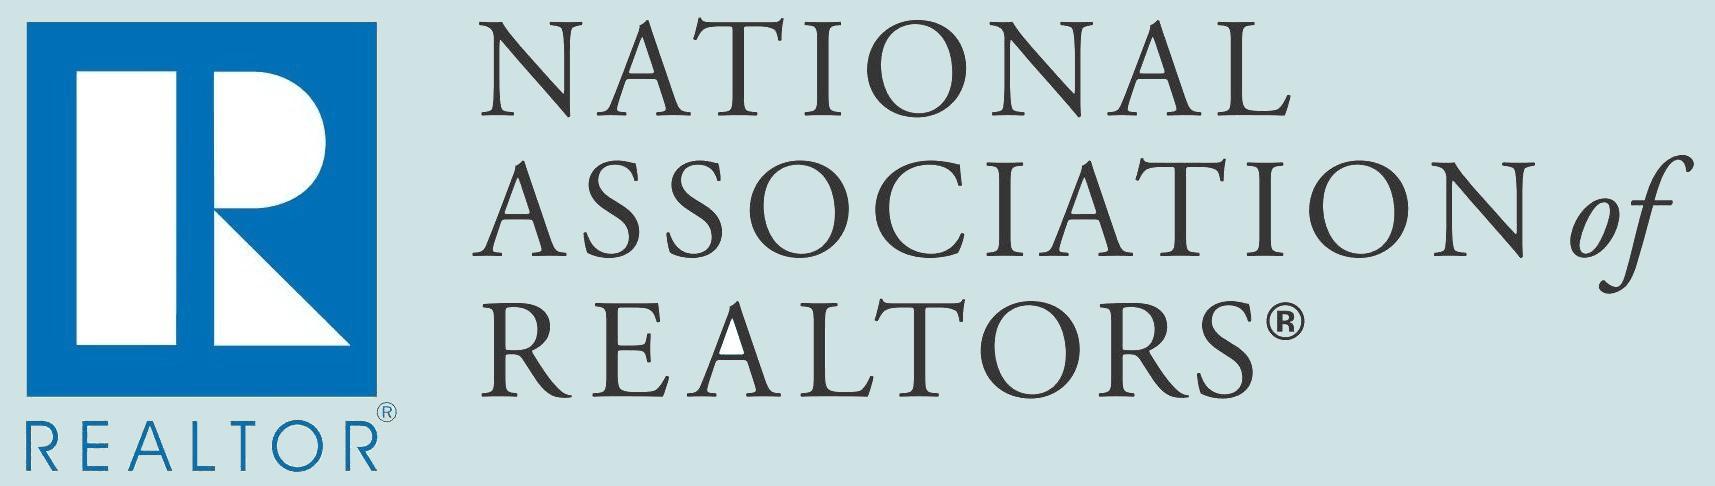 National Association of REALTORS ®